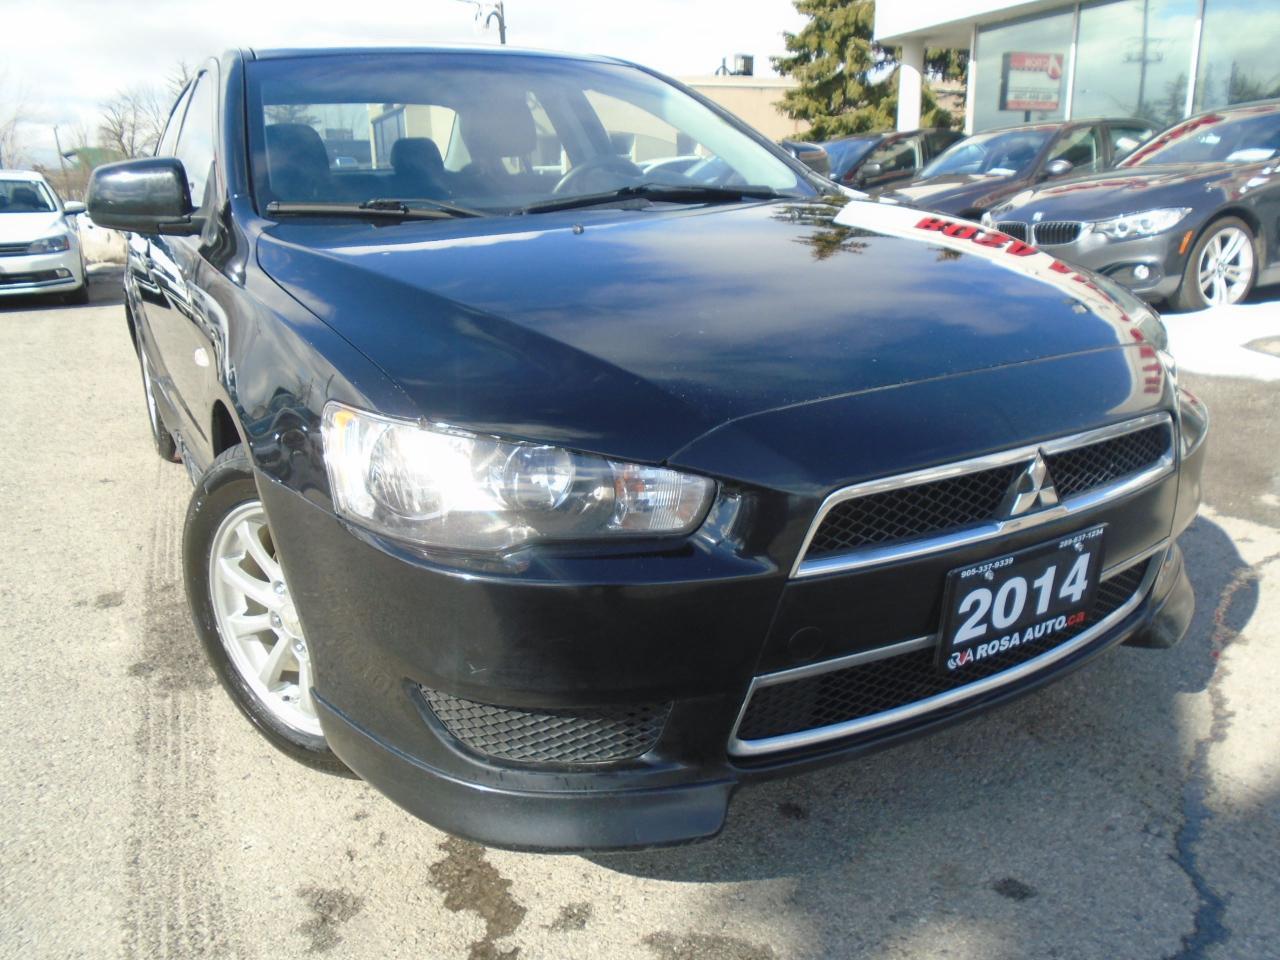 2014 Mitsubishi Lancer SE NO ACCIDENTS, BLUETOOTH,GAS SAVER ,HEATED SEATS